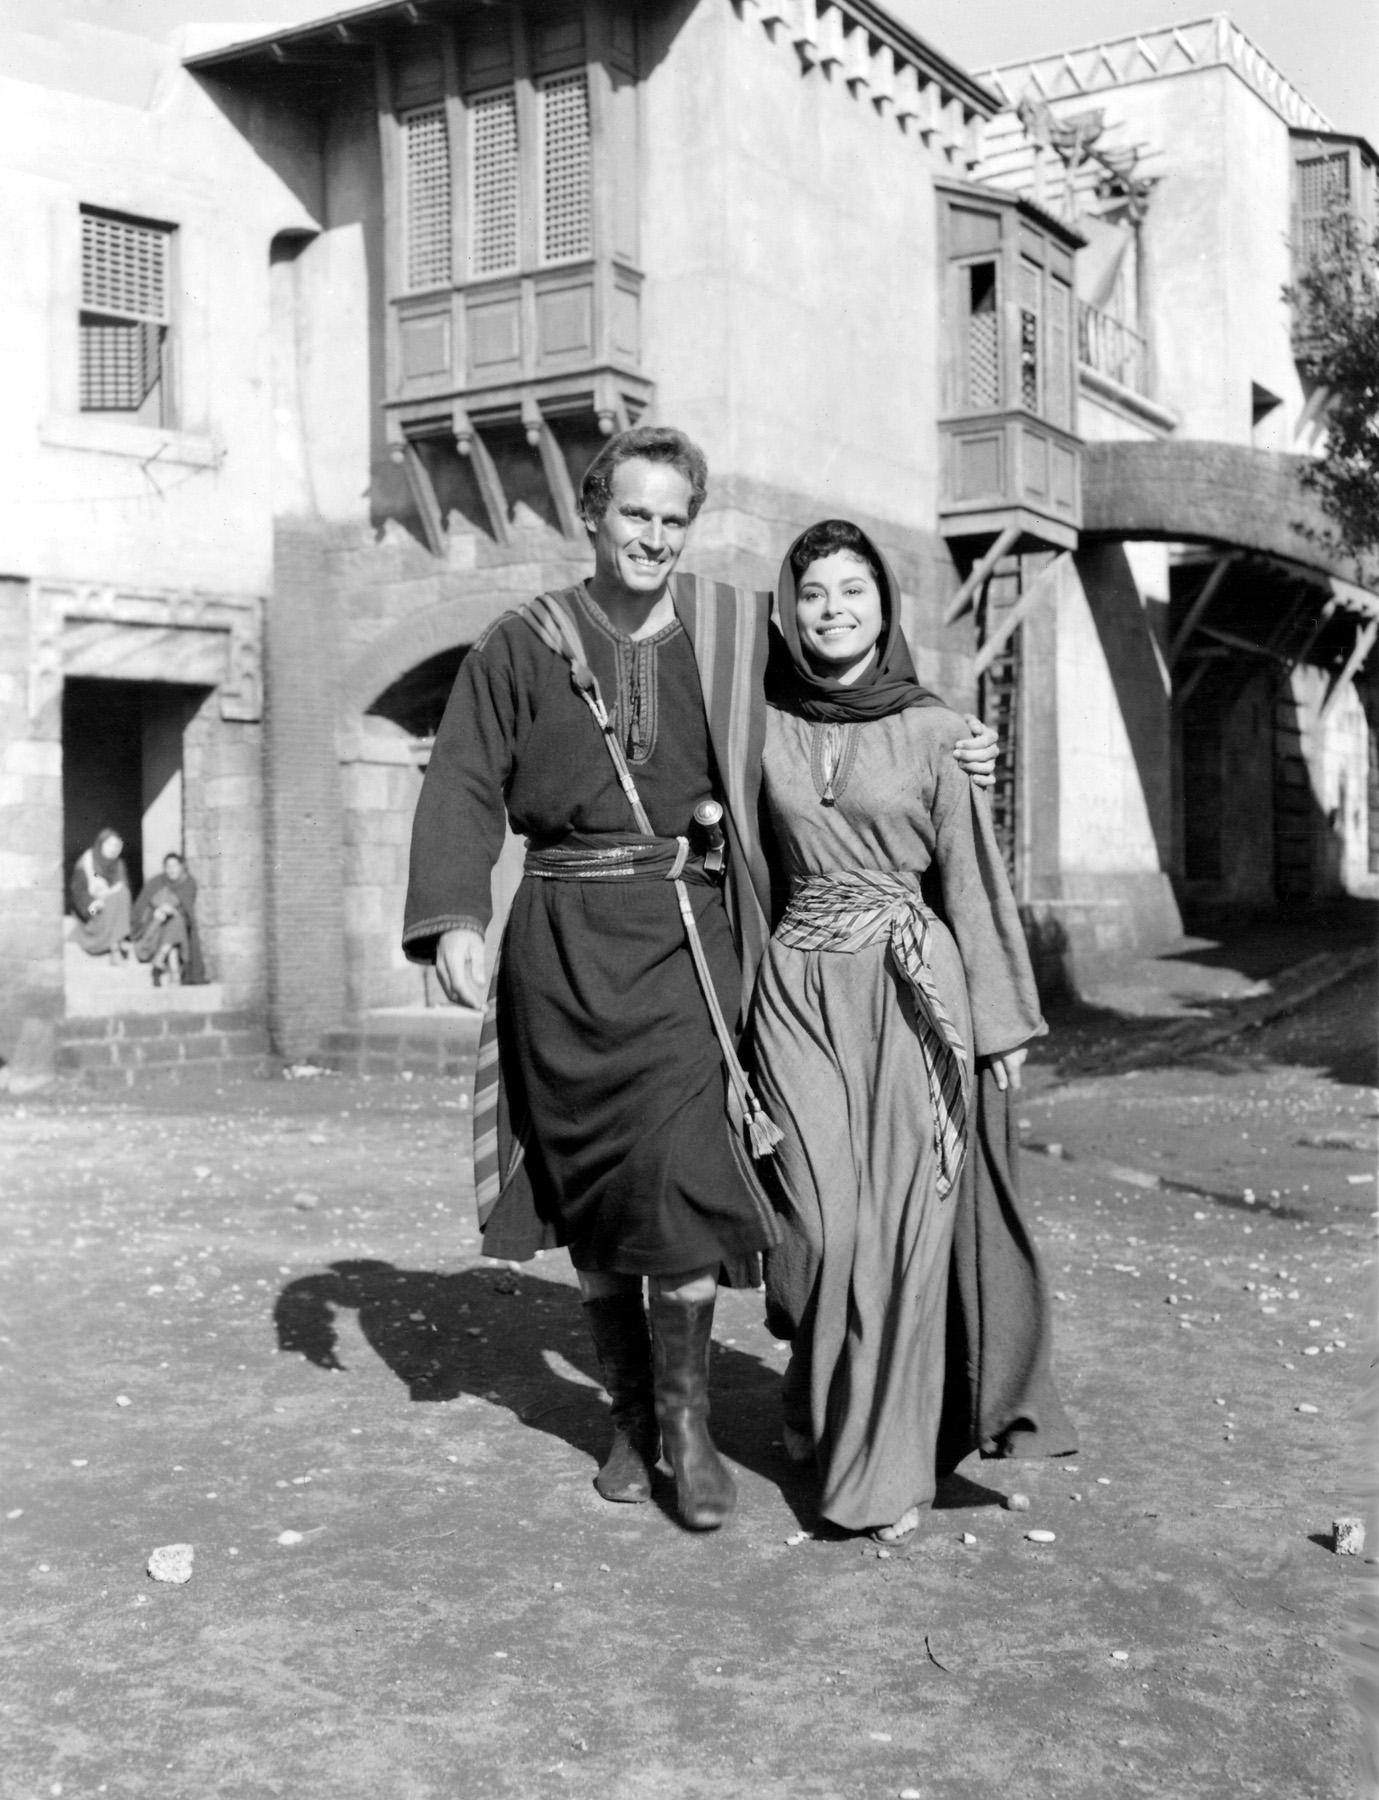 Charlton Heston in Ben-Hur With Haya Harareet